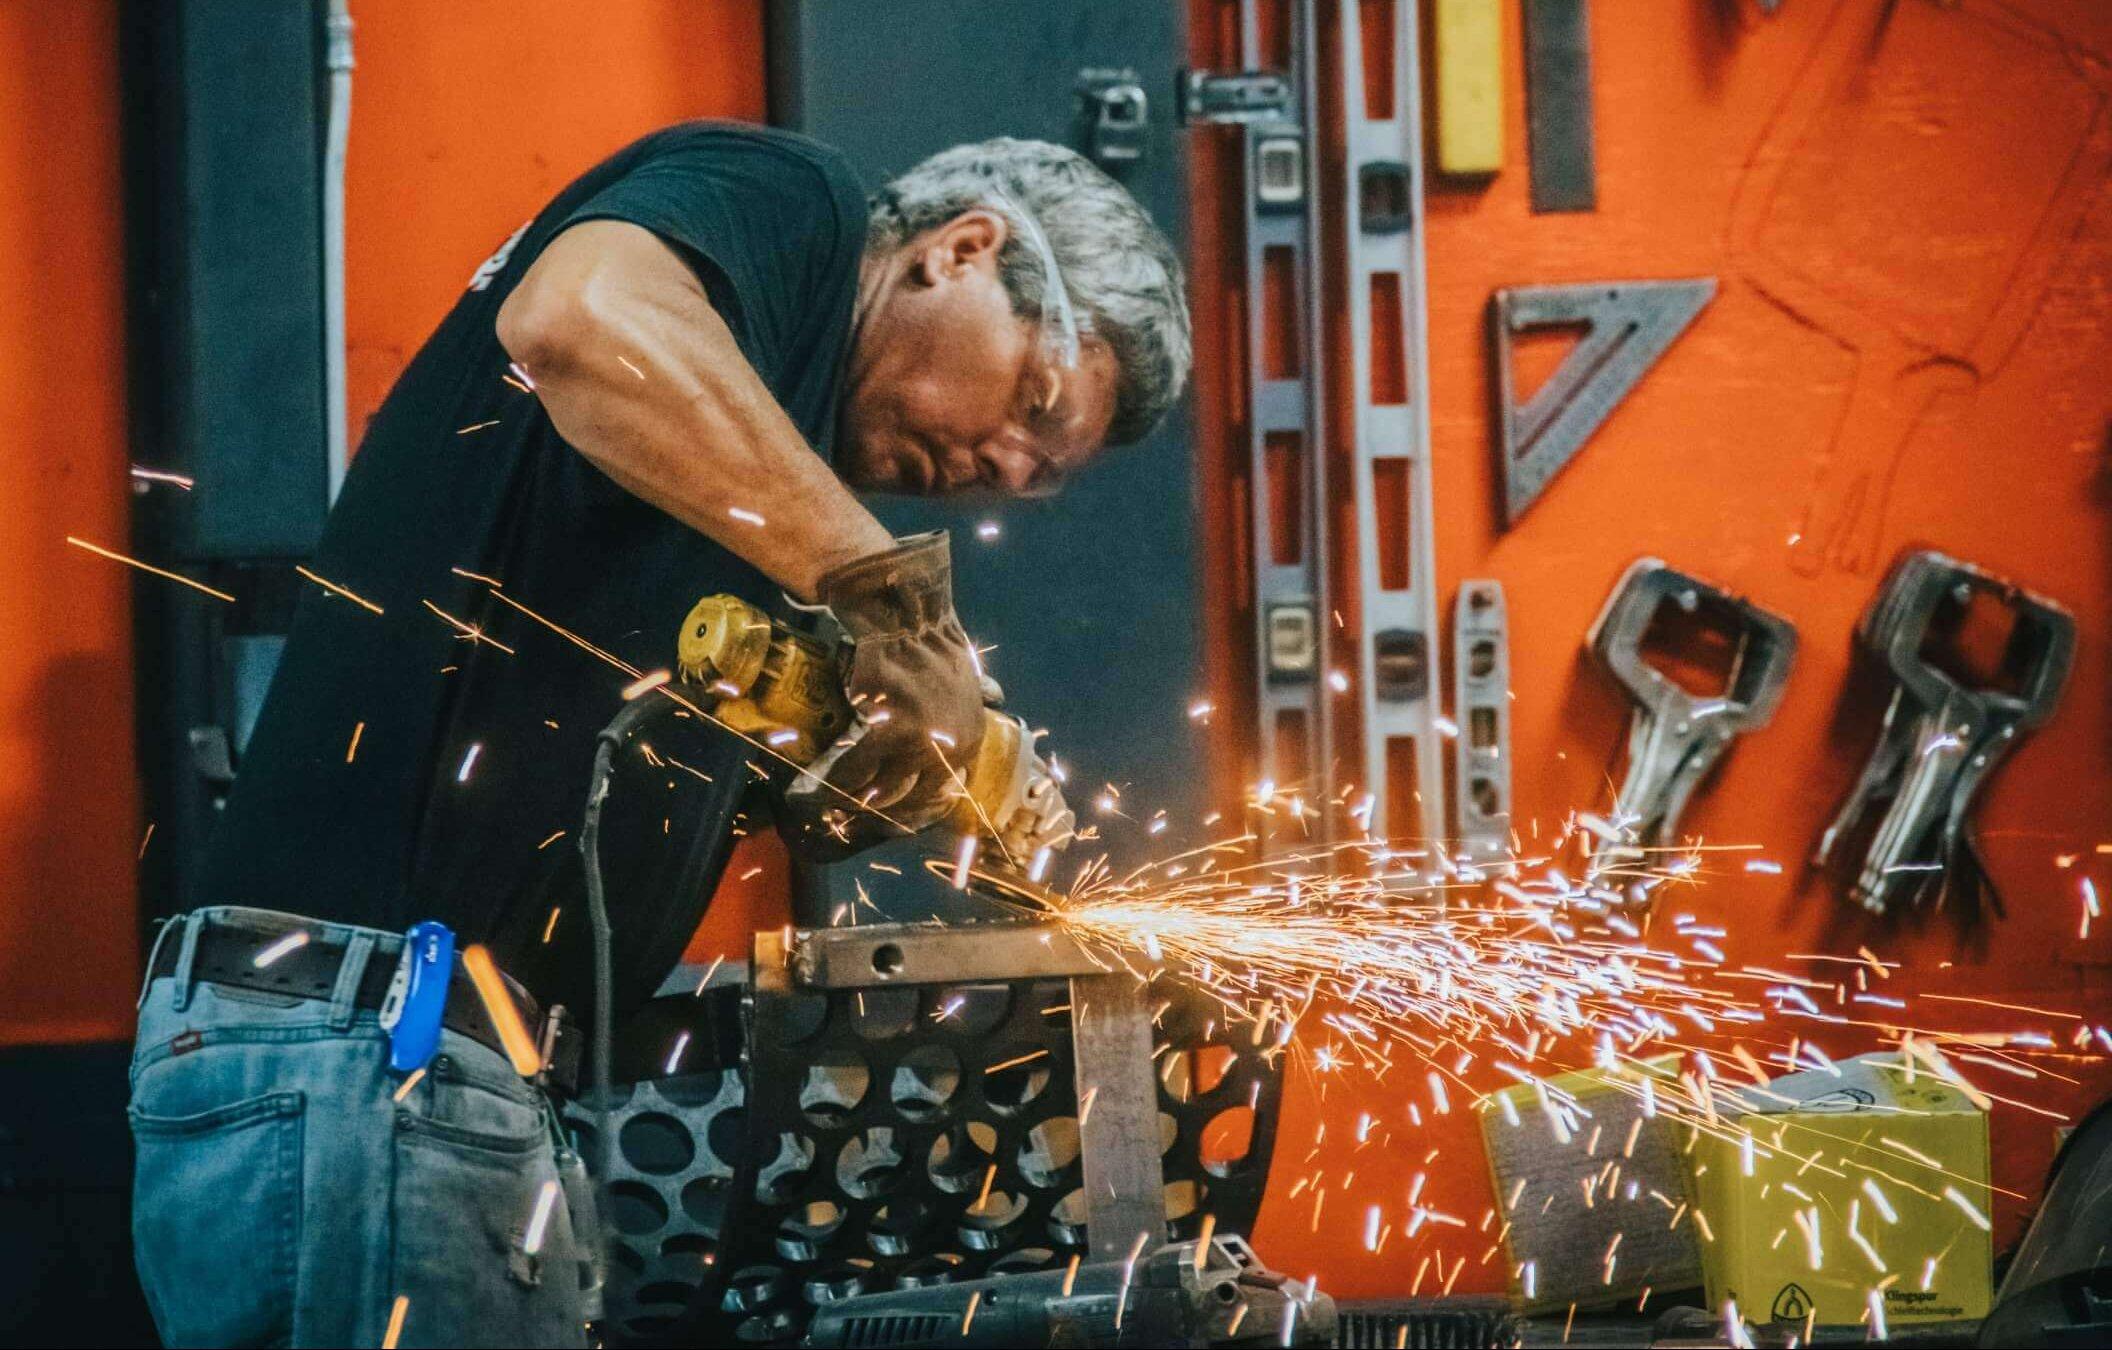 WEIMA fabricator, Burt Sanders, grinding a metal screen